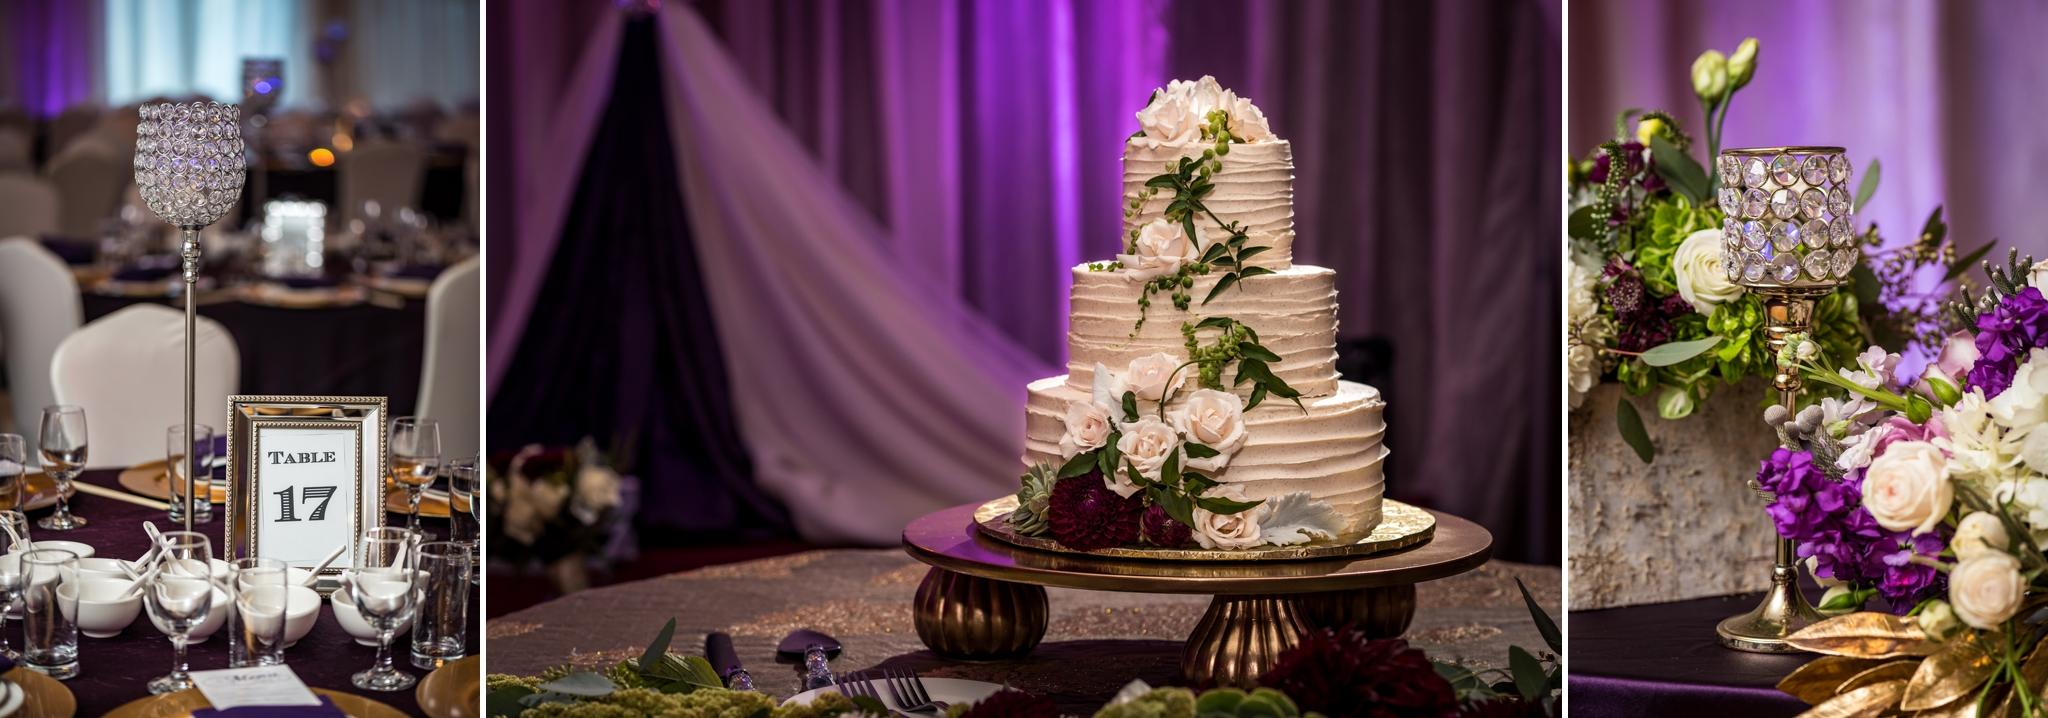 Lancy-Adam-Details-Wedding-Hakone-Saratoga-Satvedi-Photography